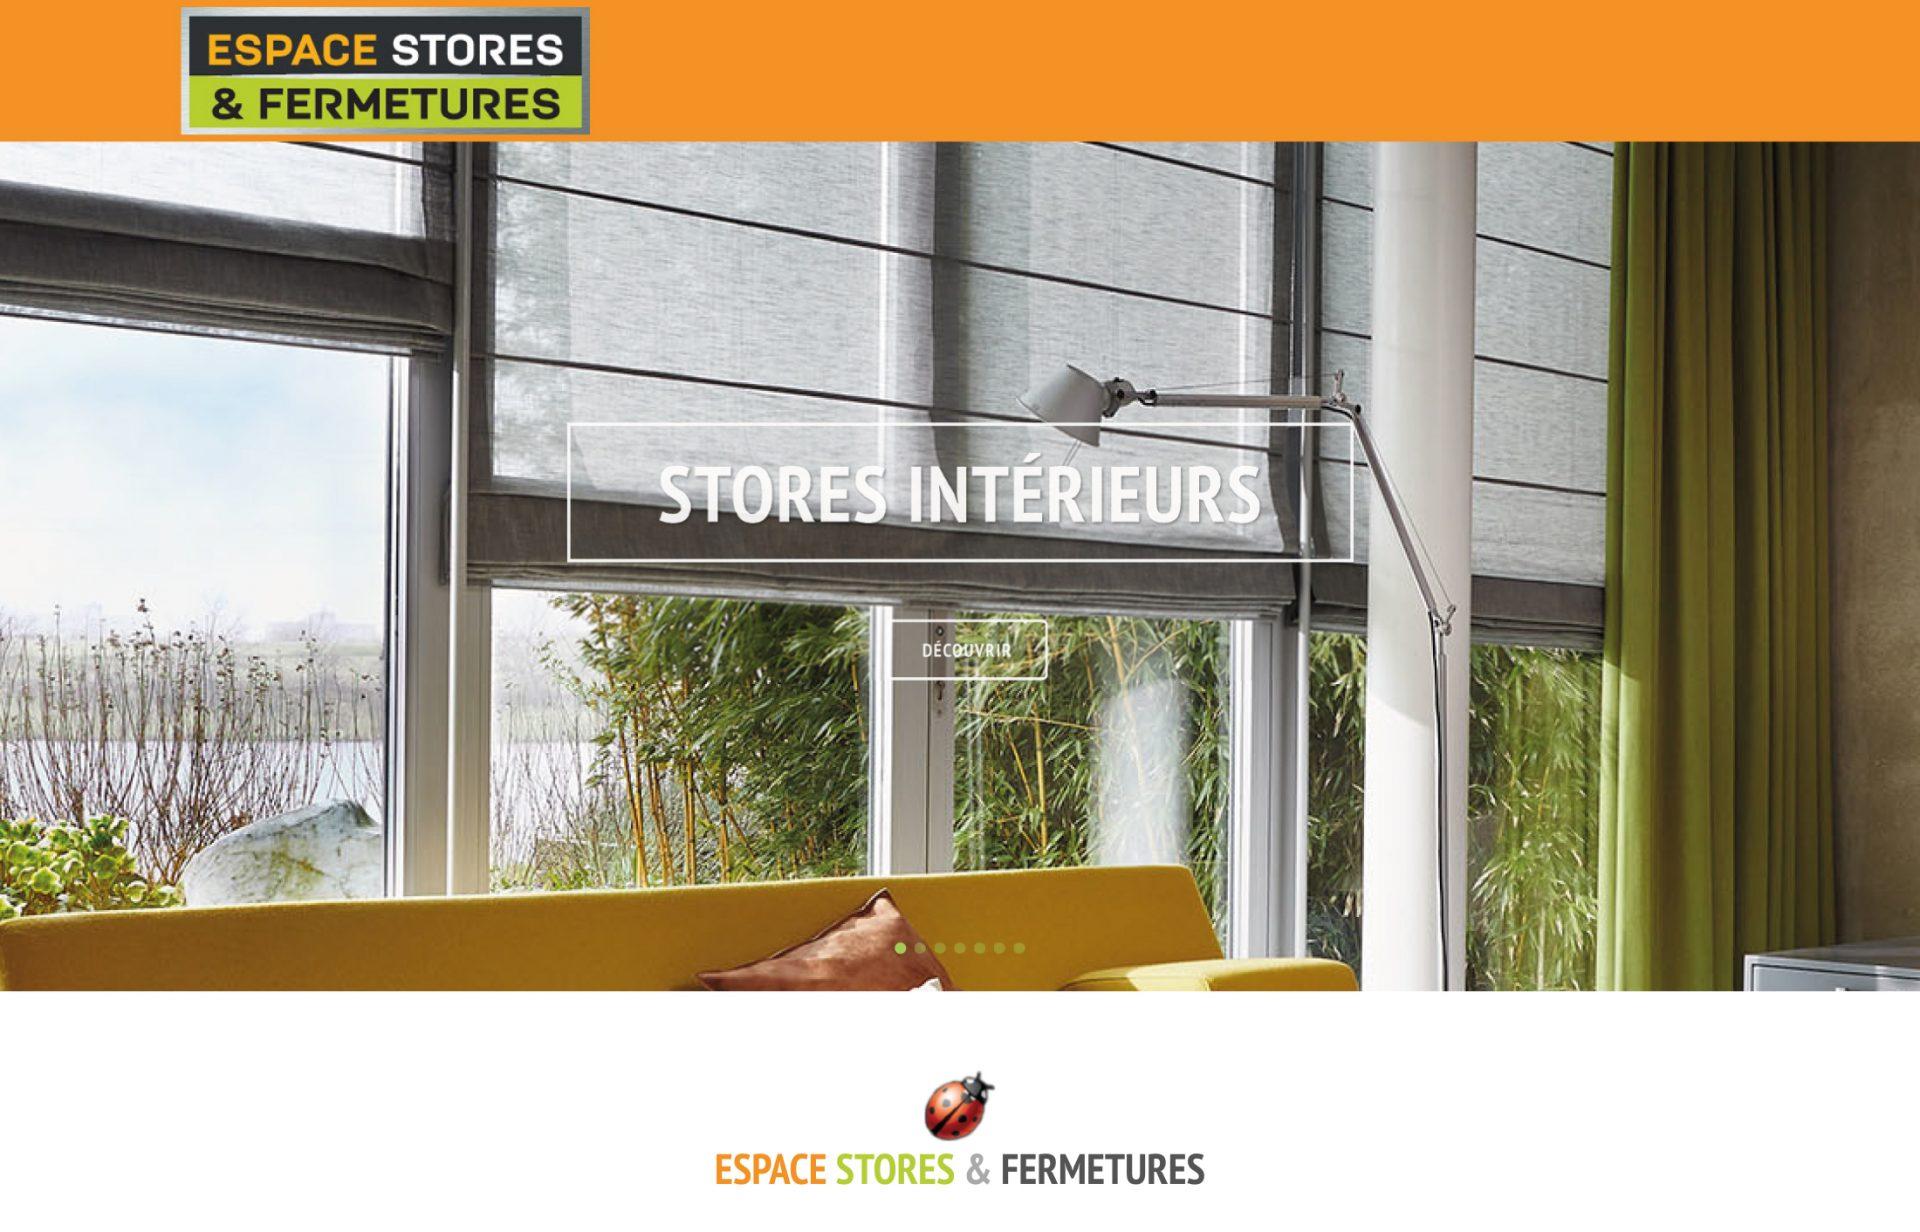 Espace Stores & Fermetures